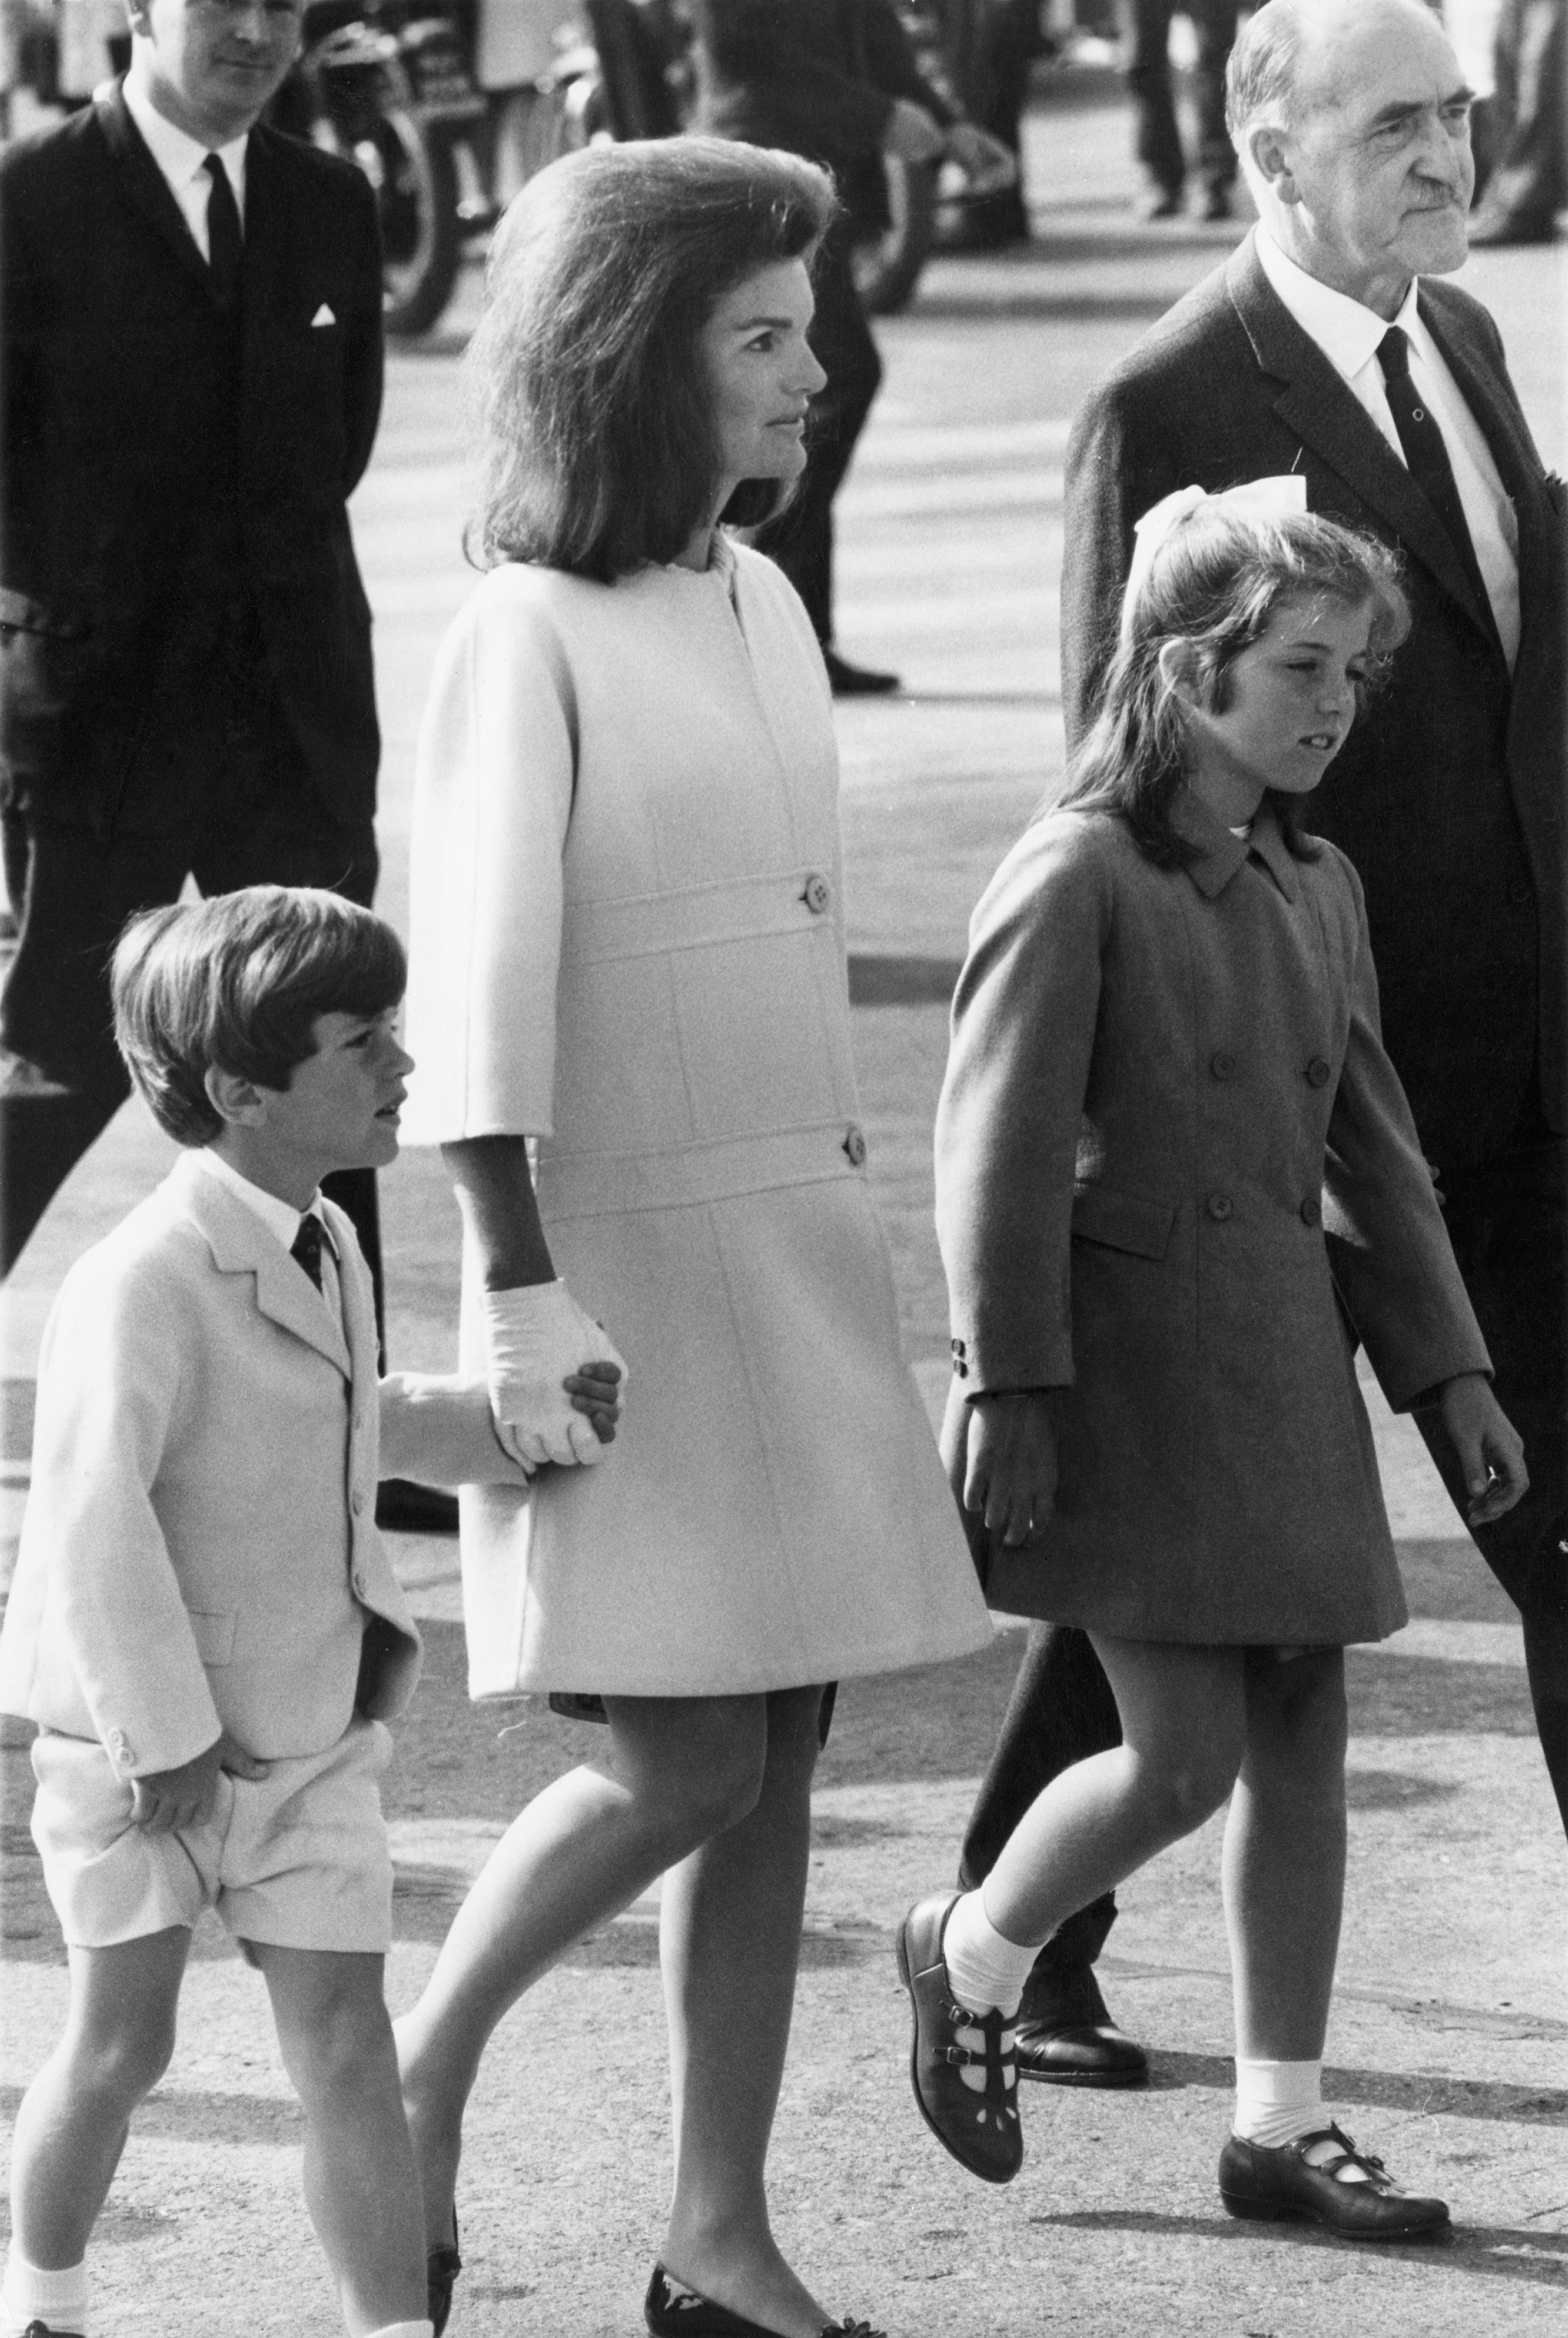 Джаки О. с Каролин и Джон Кенеди в Ирландия